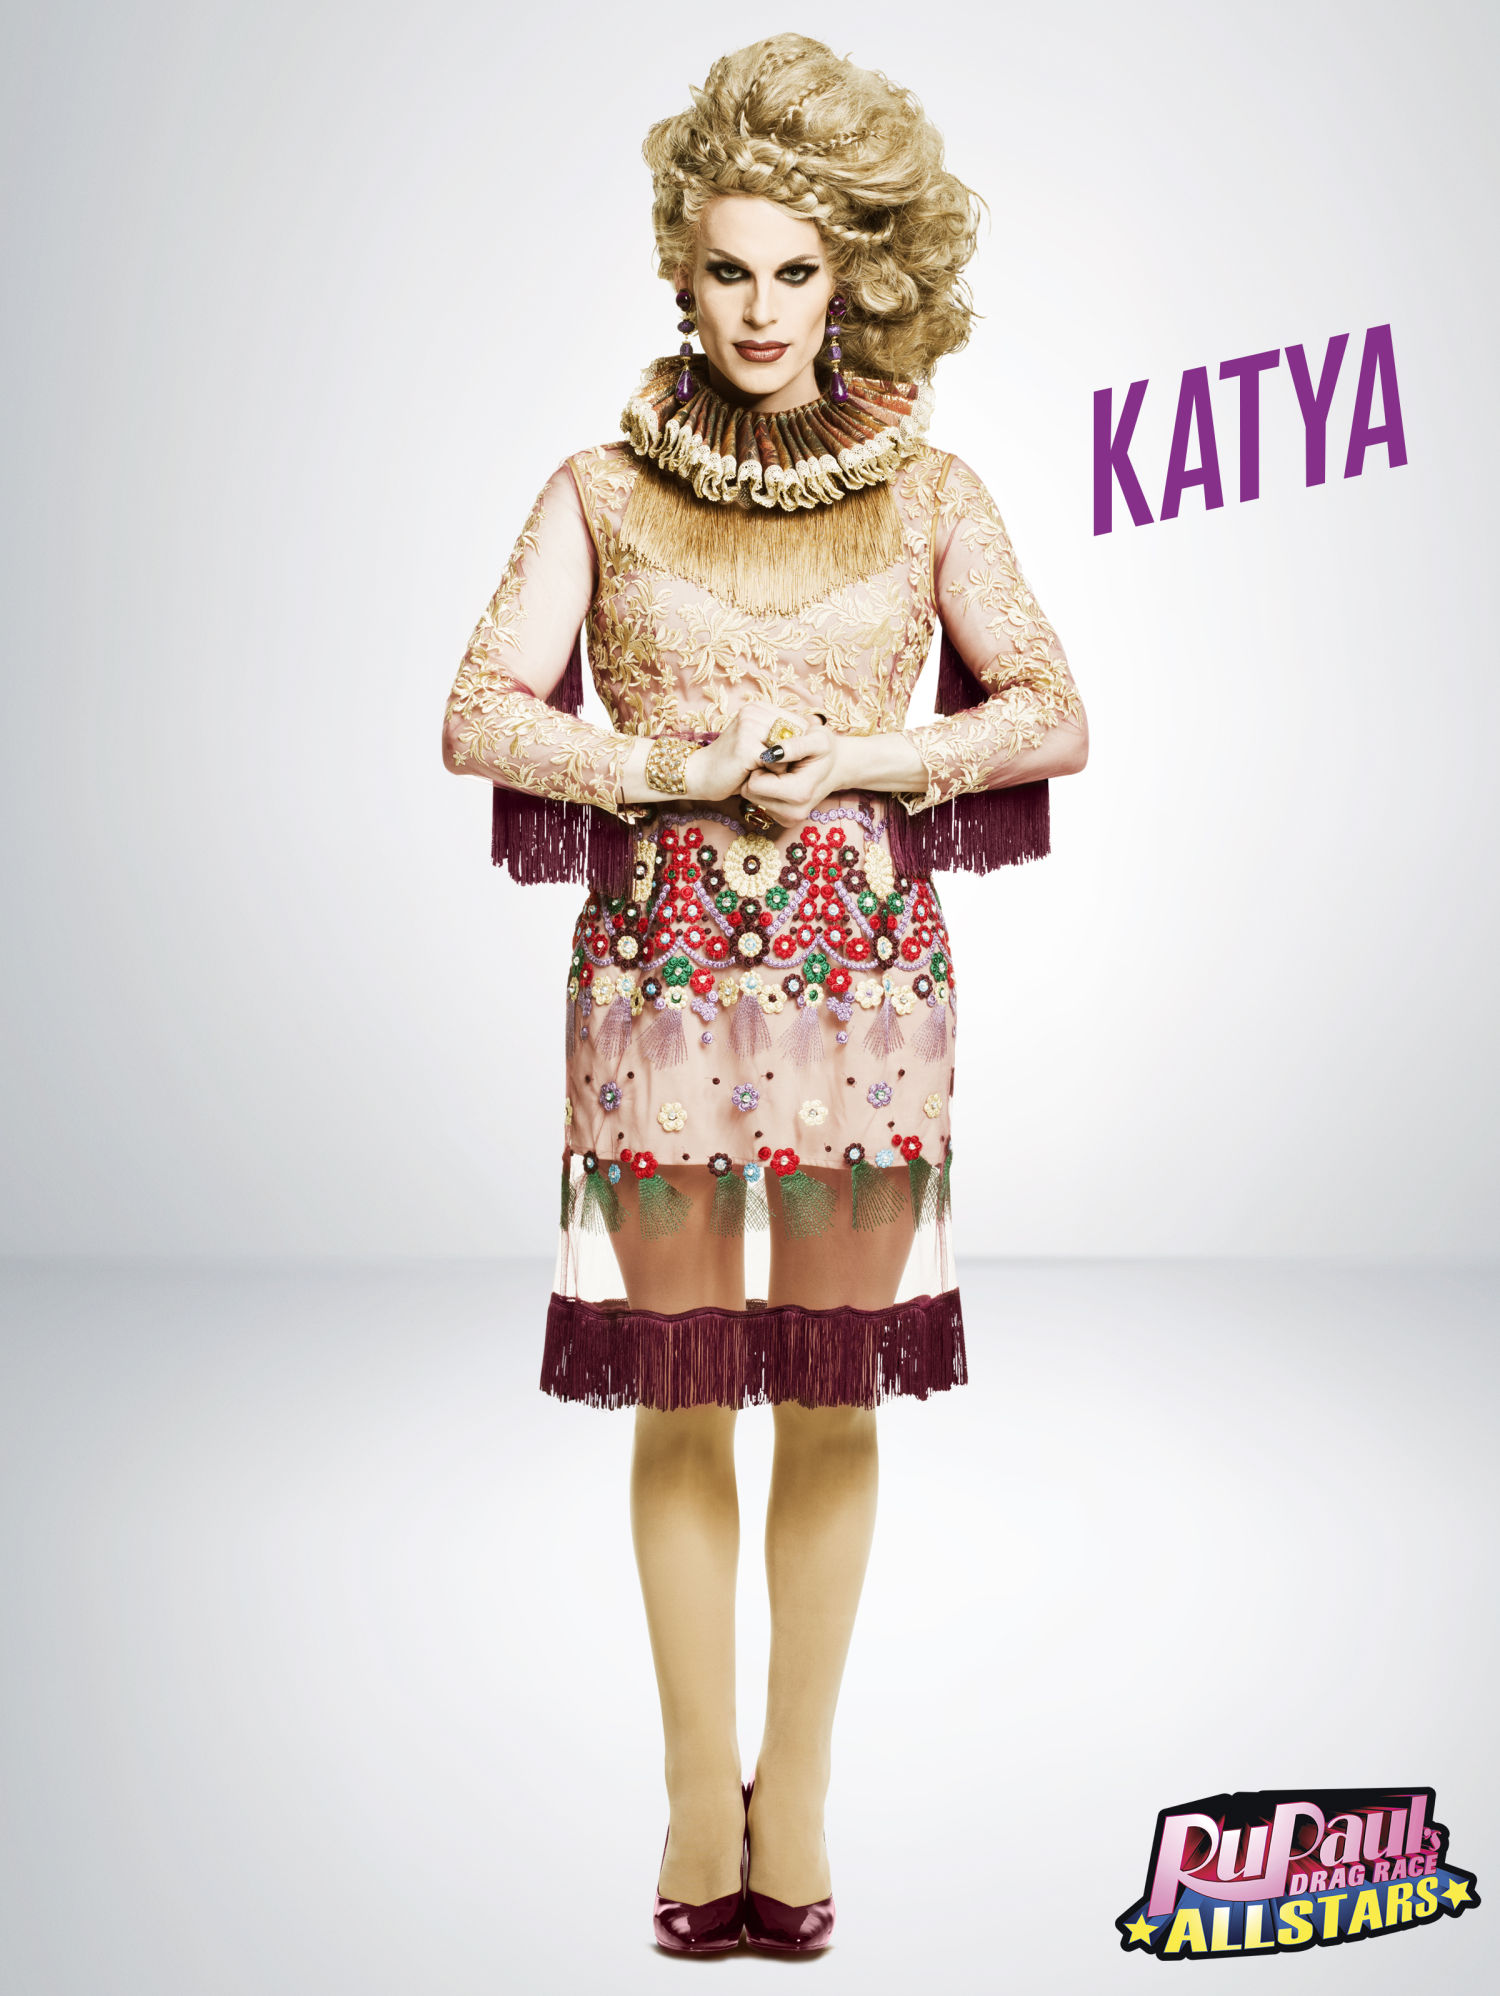 614b981a63a5 Katya Zamolodchikova